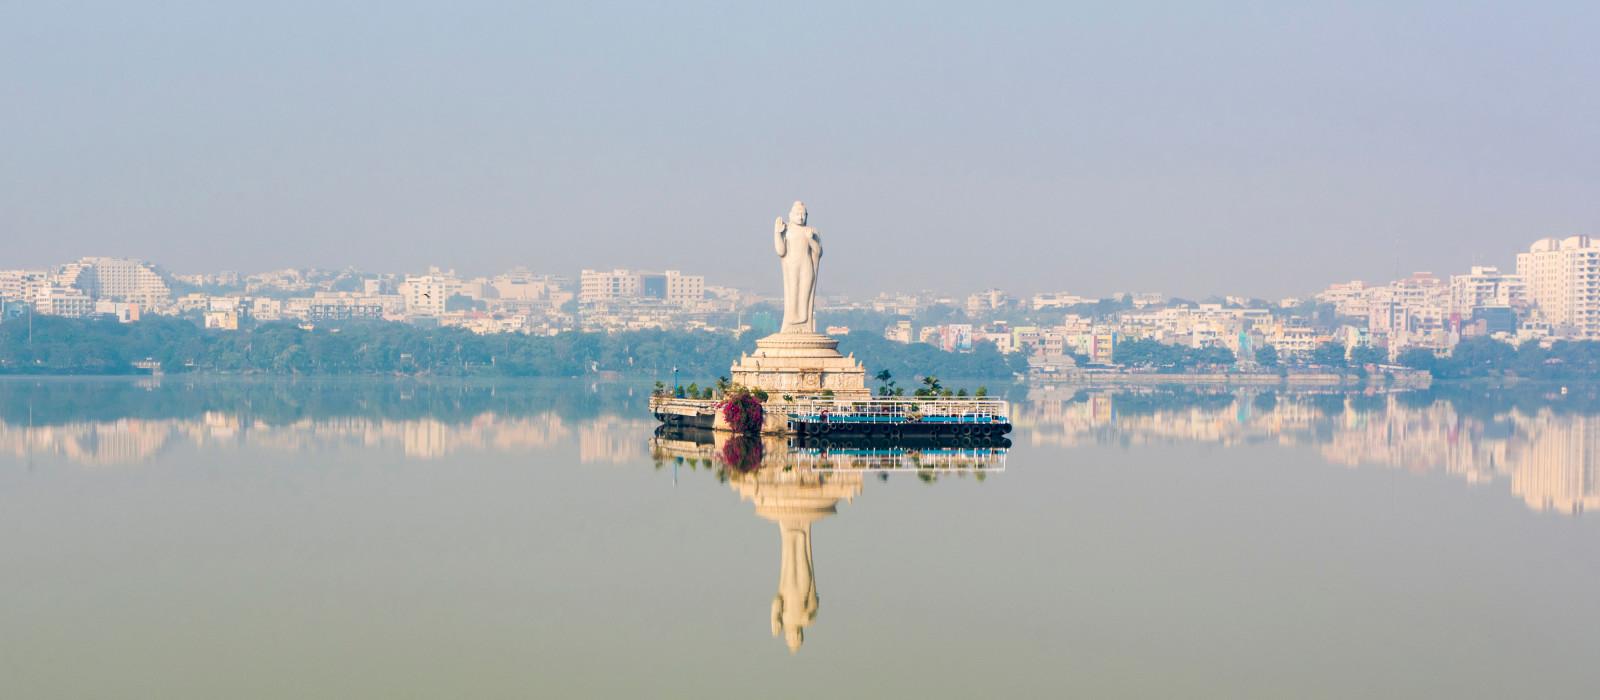 Hussain Sagar Lake, Hyderabad, Telangana, India